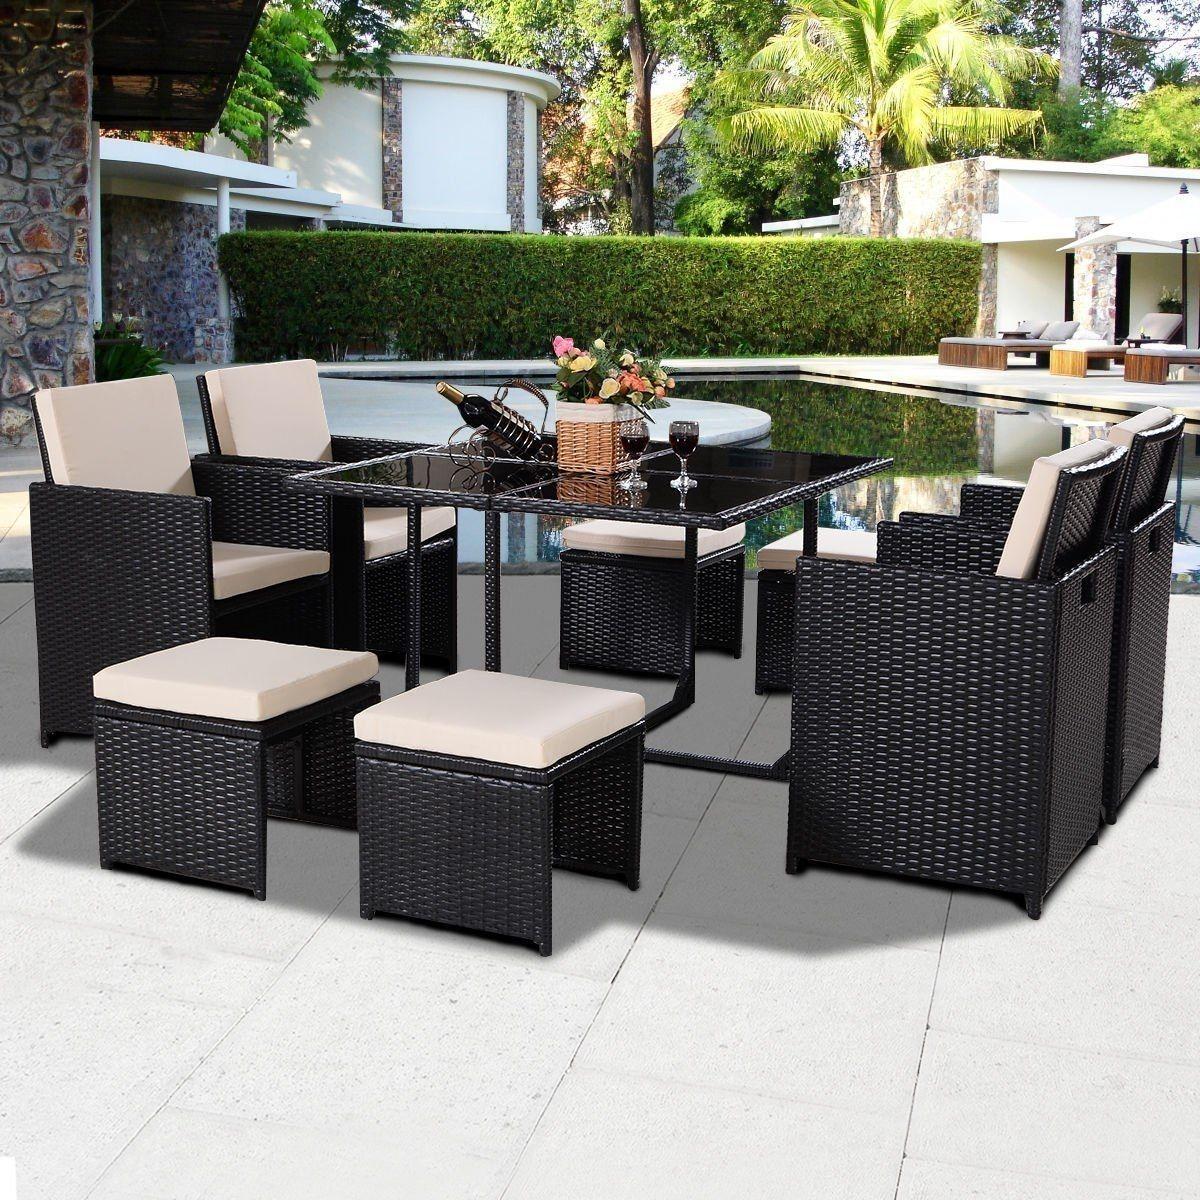 Nice Outdoor Wicker Patio Furniture! We Love Wicker Furniture Outside On A  Patio, Balcony,